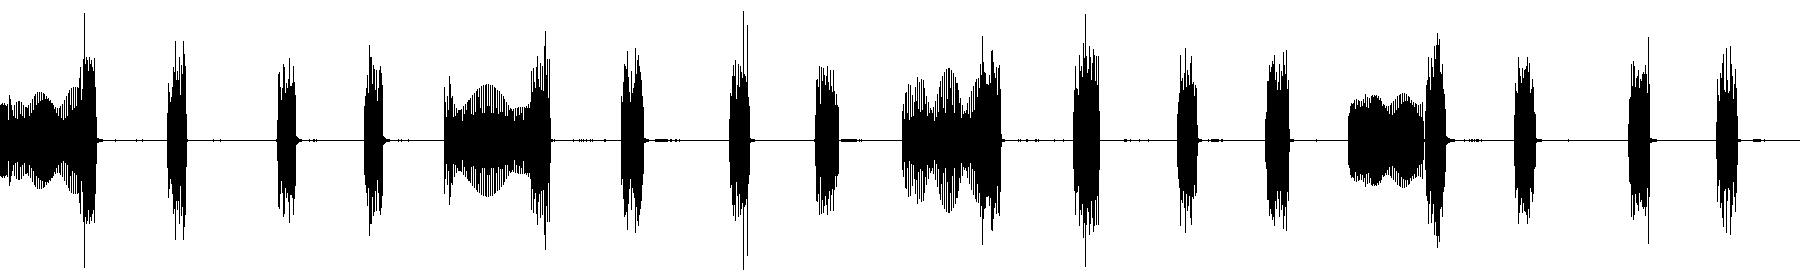 125 c chords 02